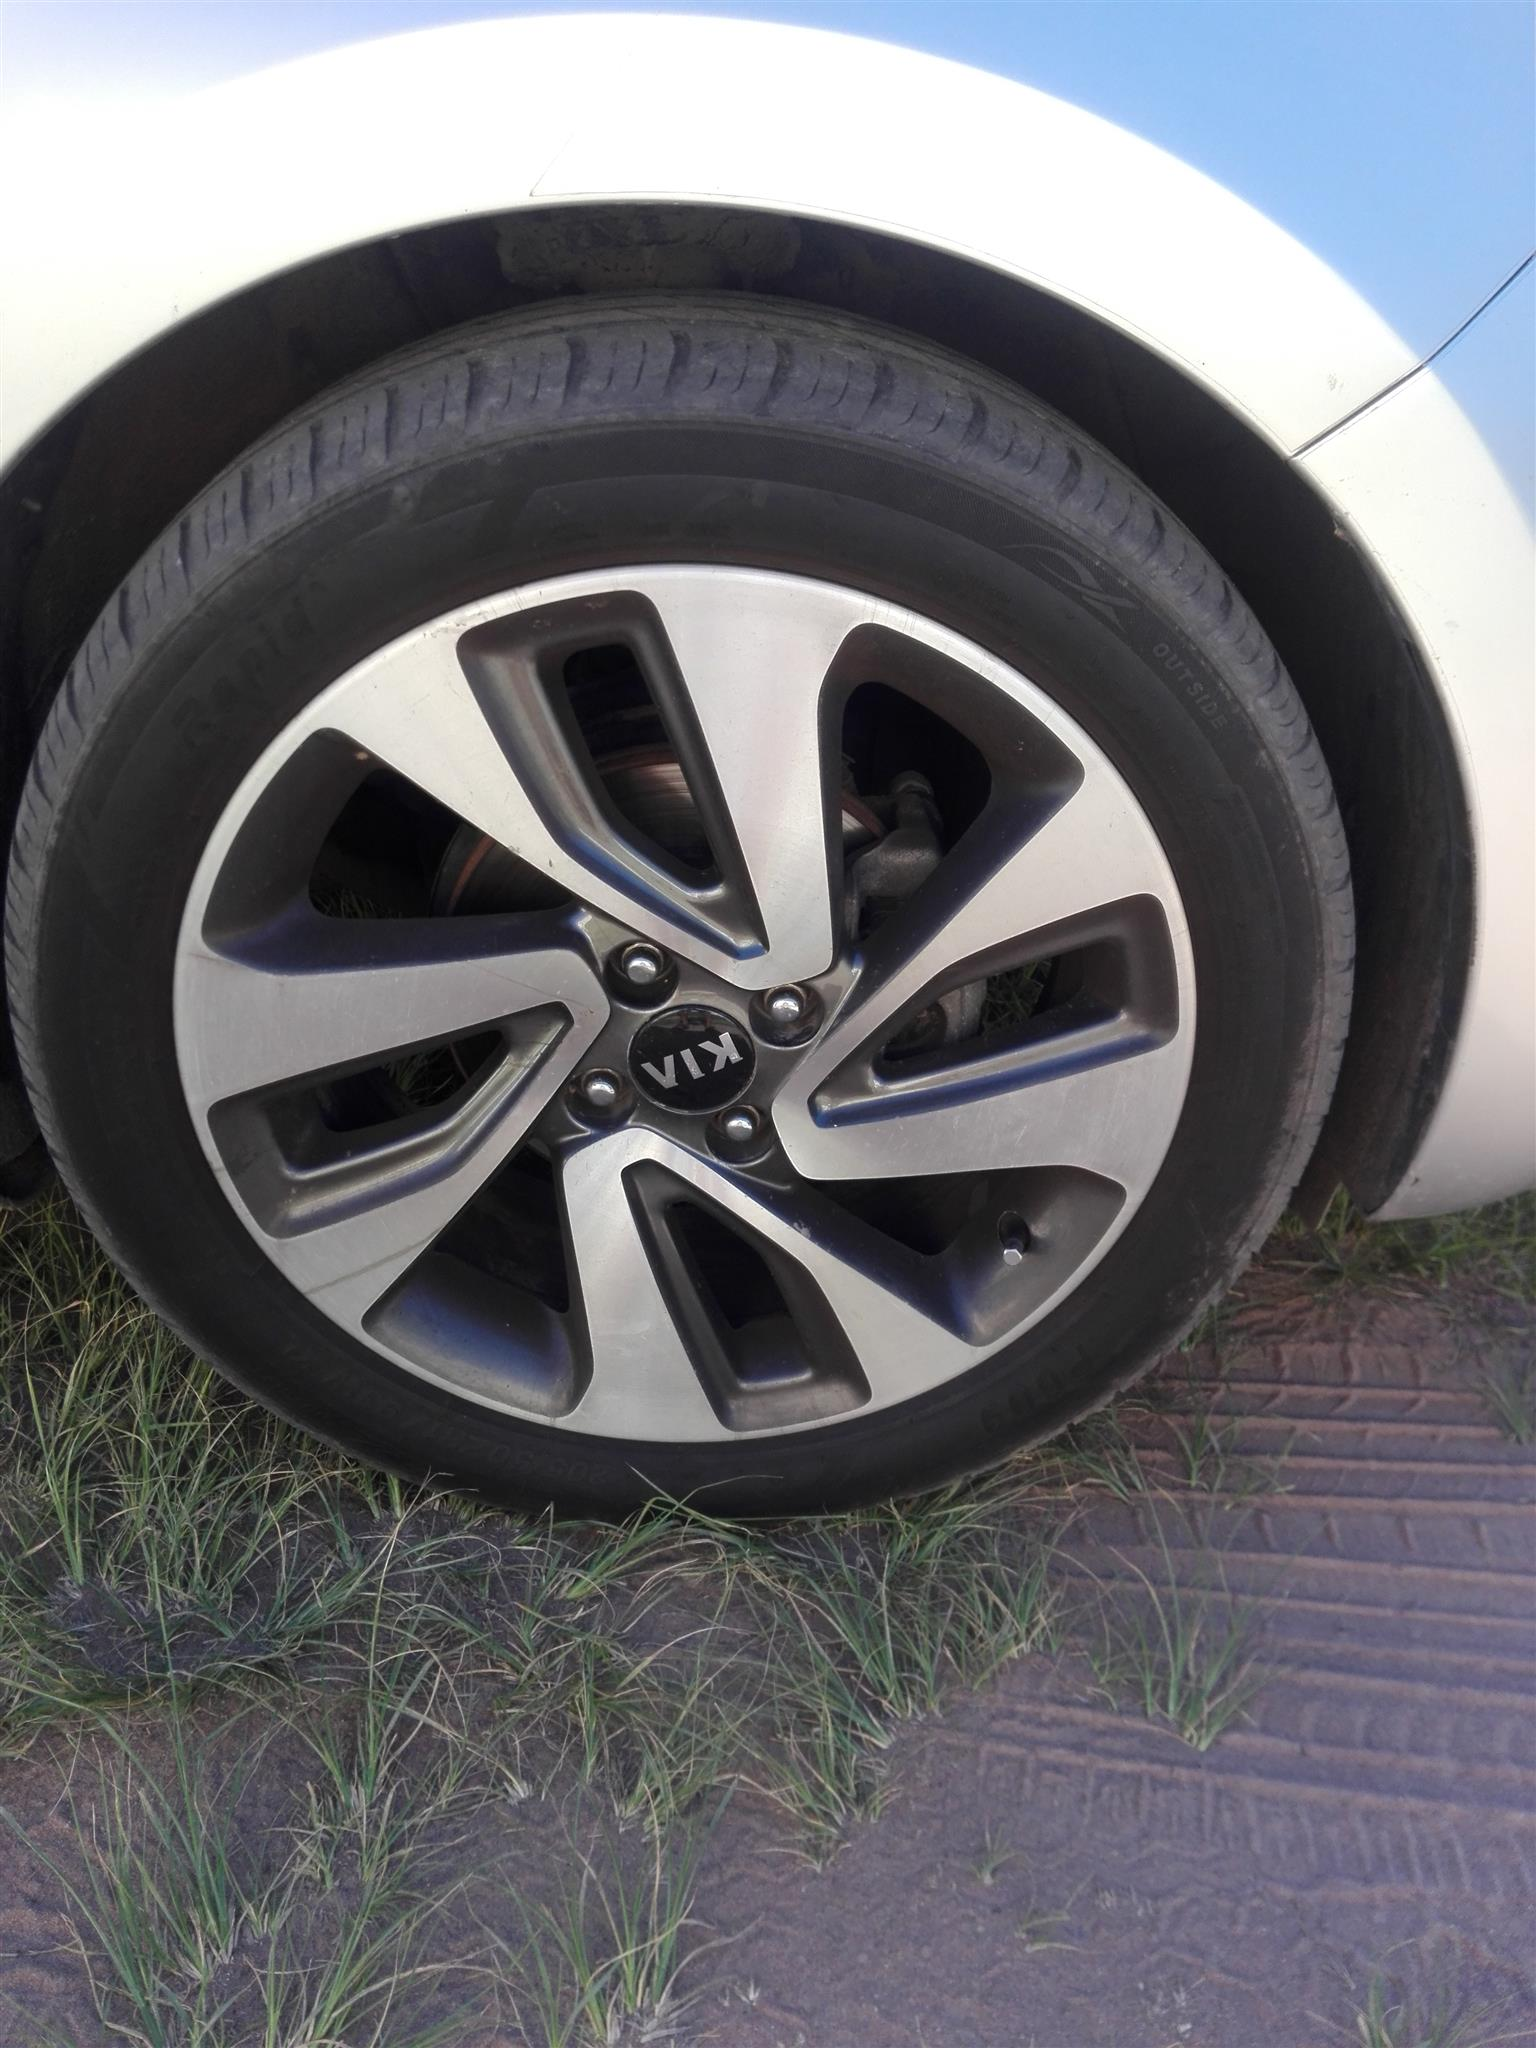 2015 Kia Rio 1.4 4 door high spec